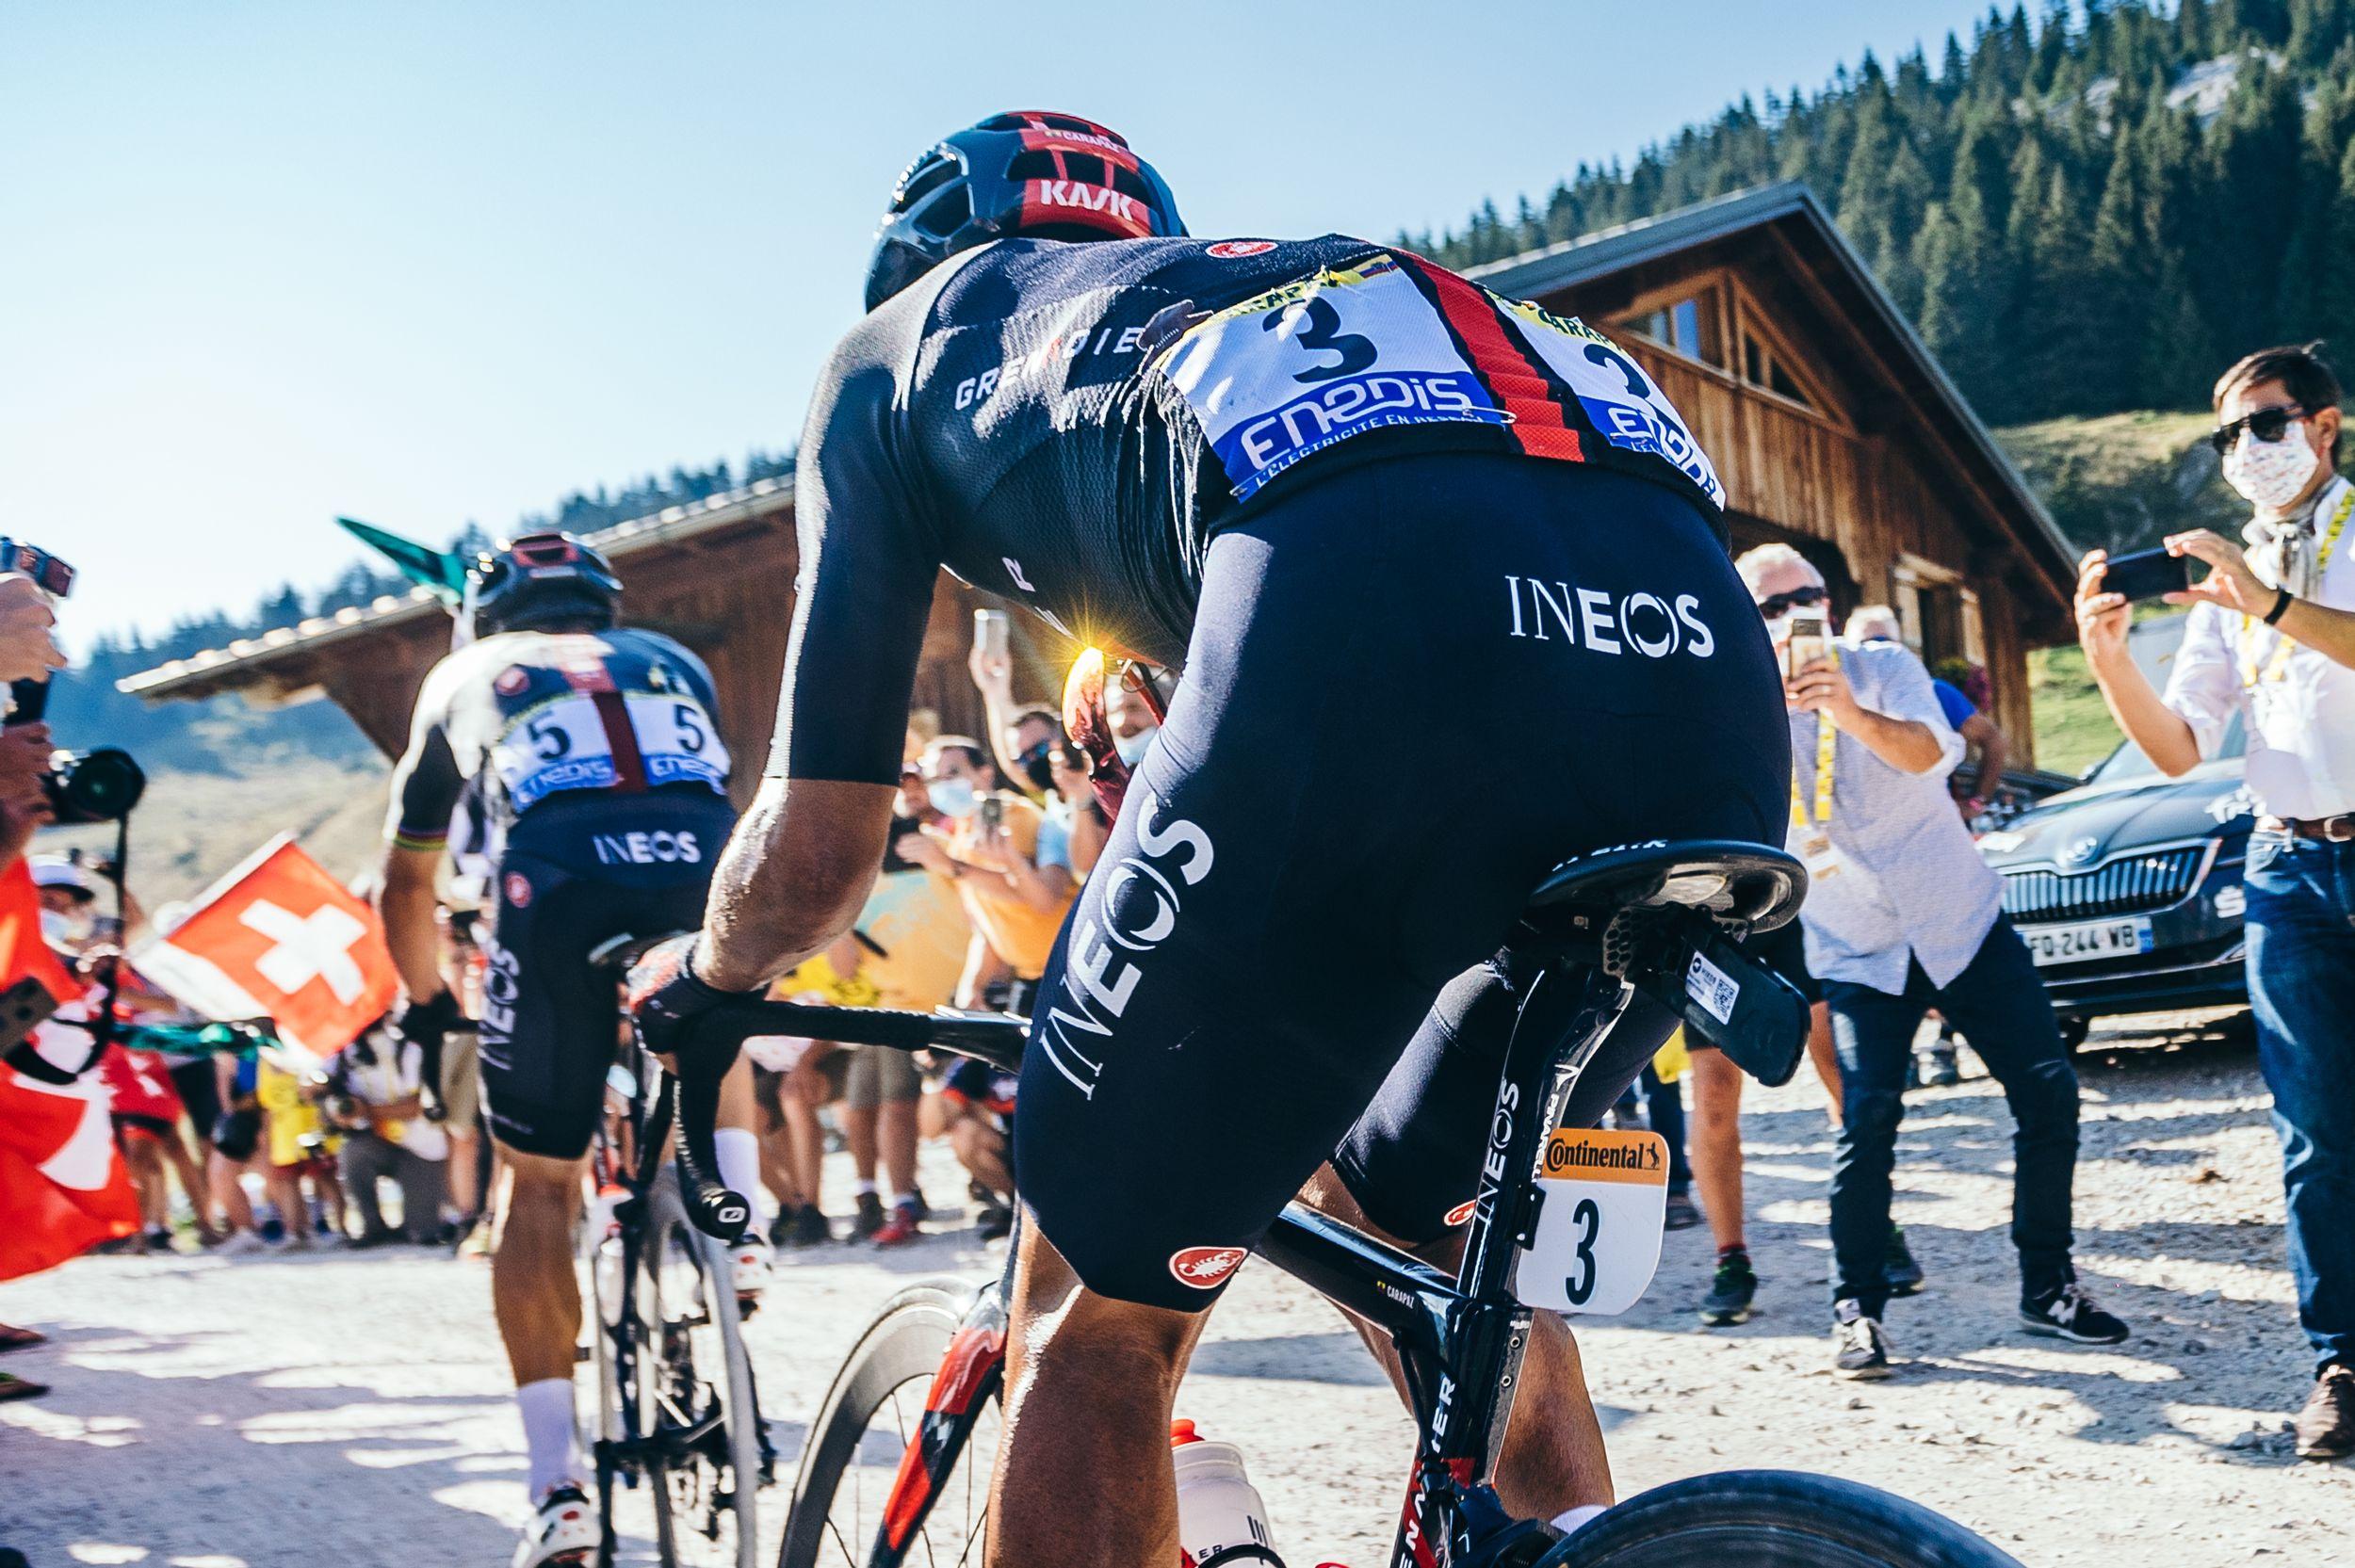 Team Ineos Grenadiers Tour de France